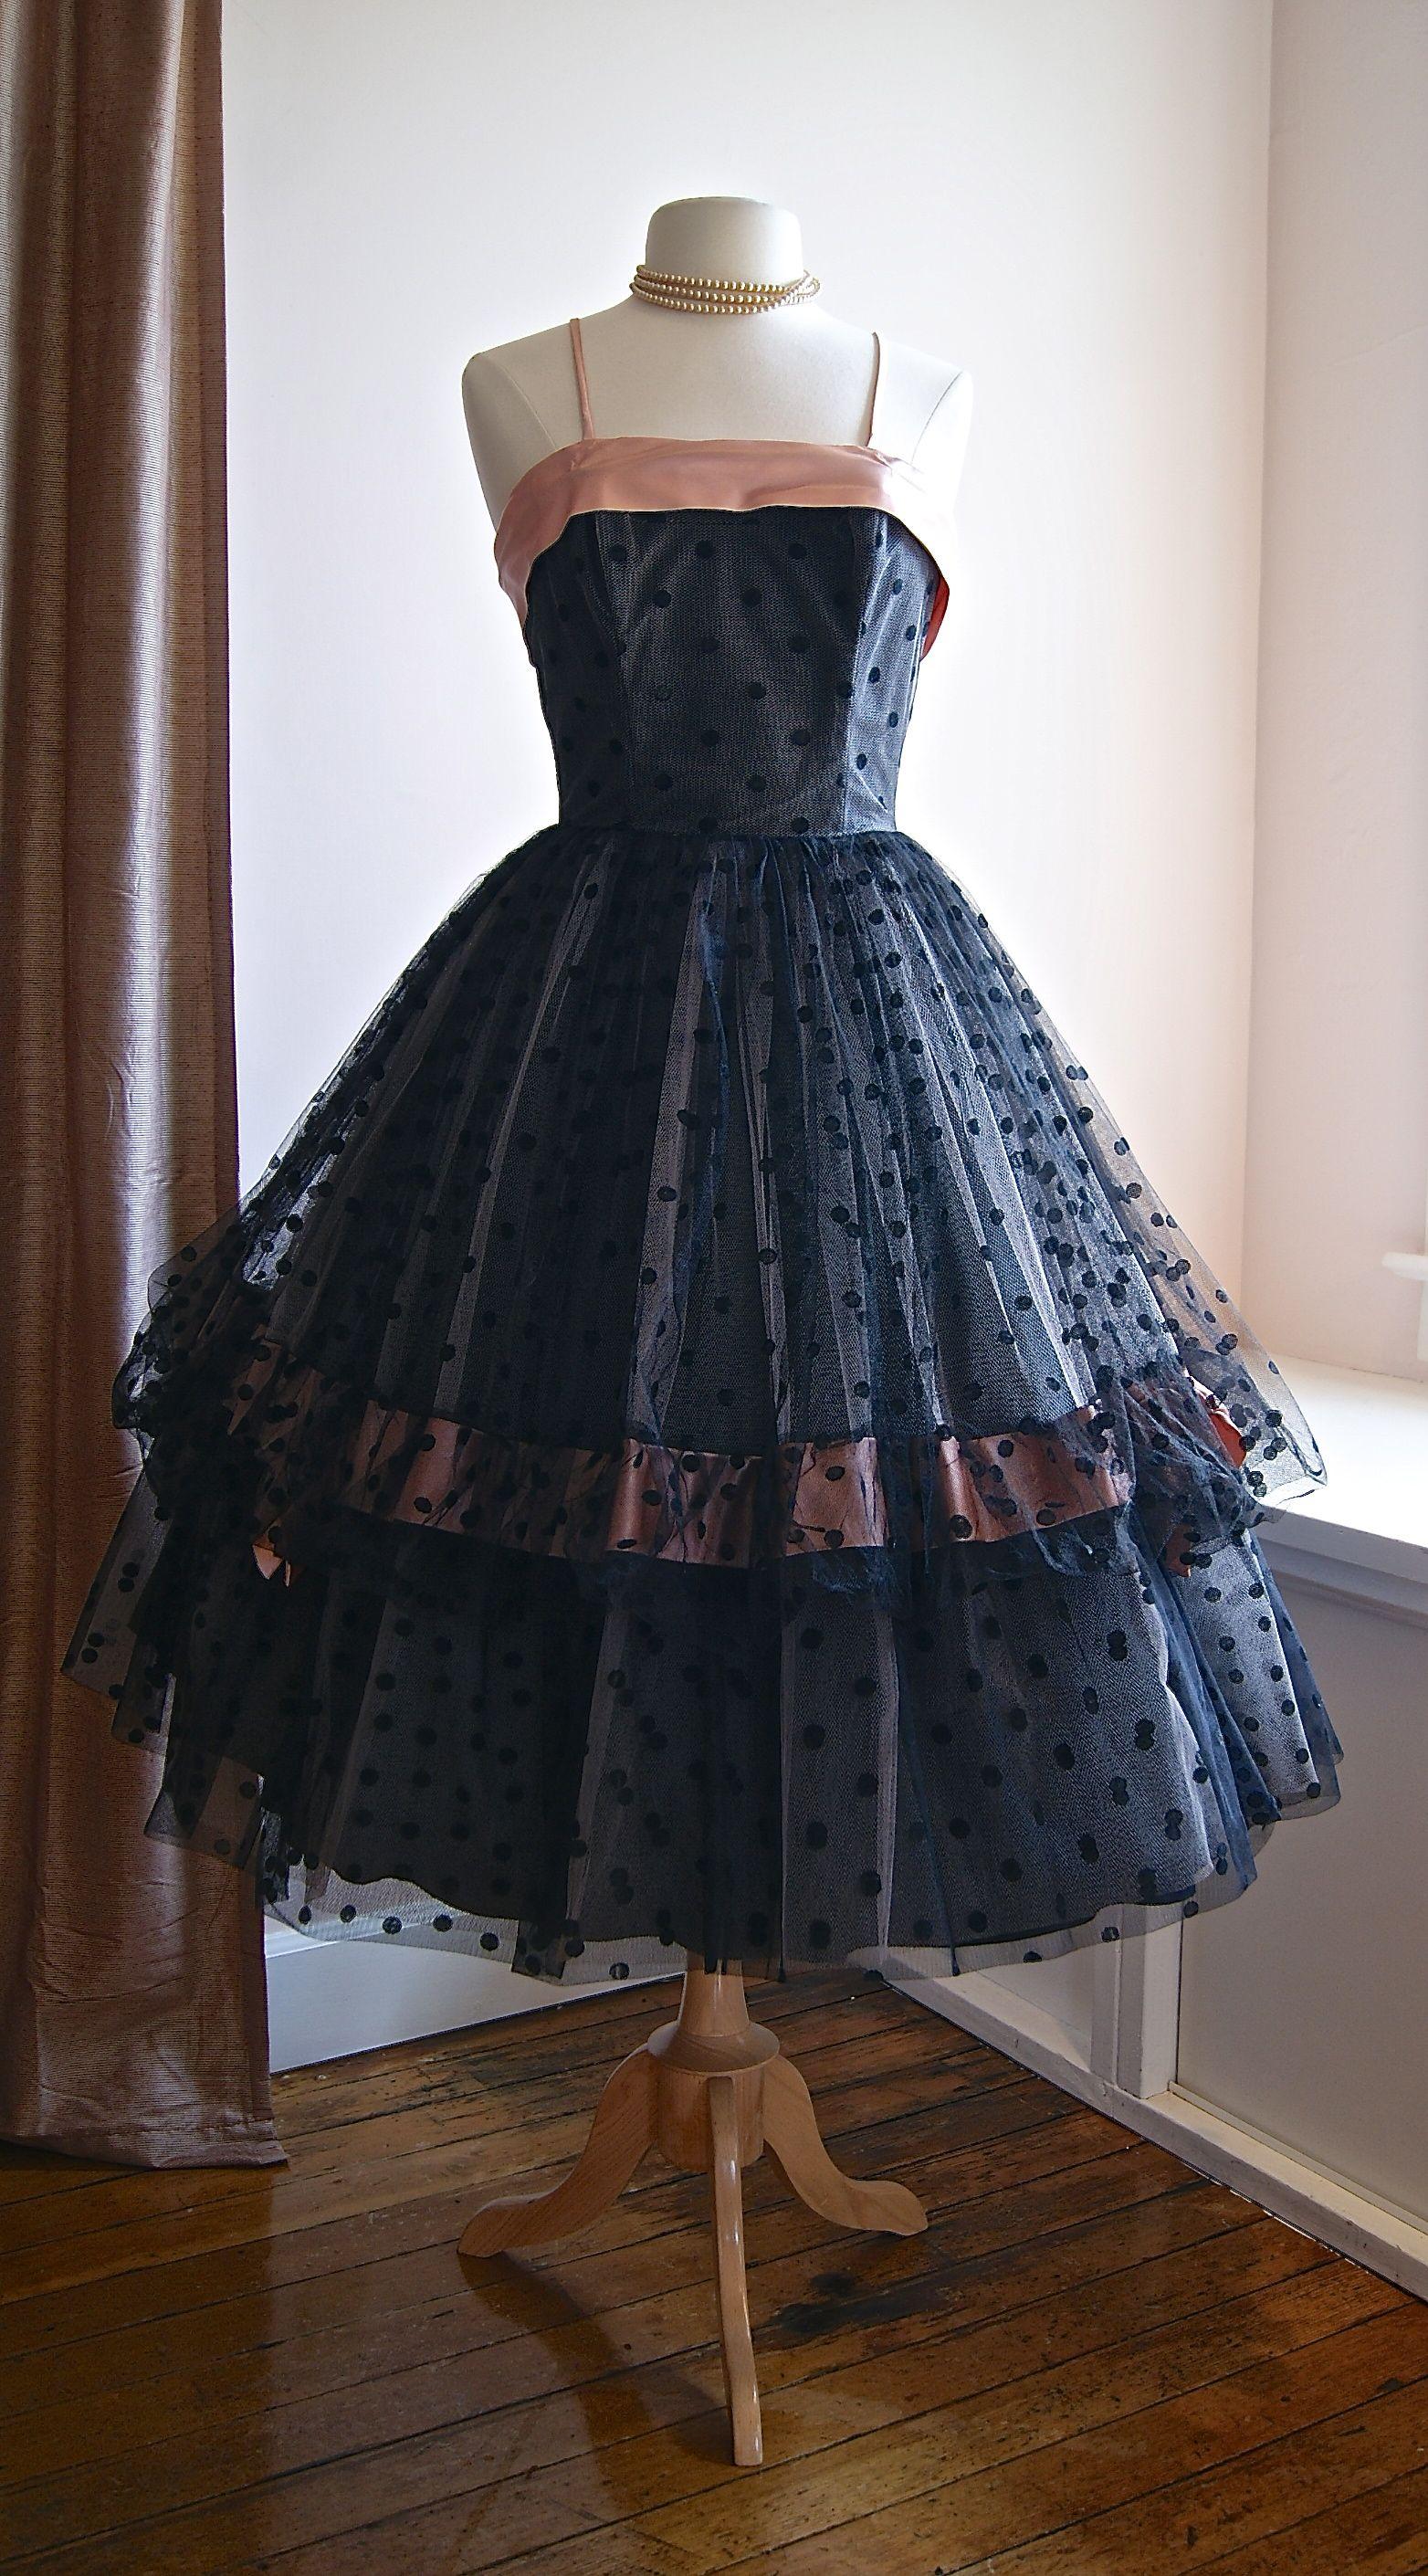 Vintage prom dress us black and pink polka dot party dress at